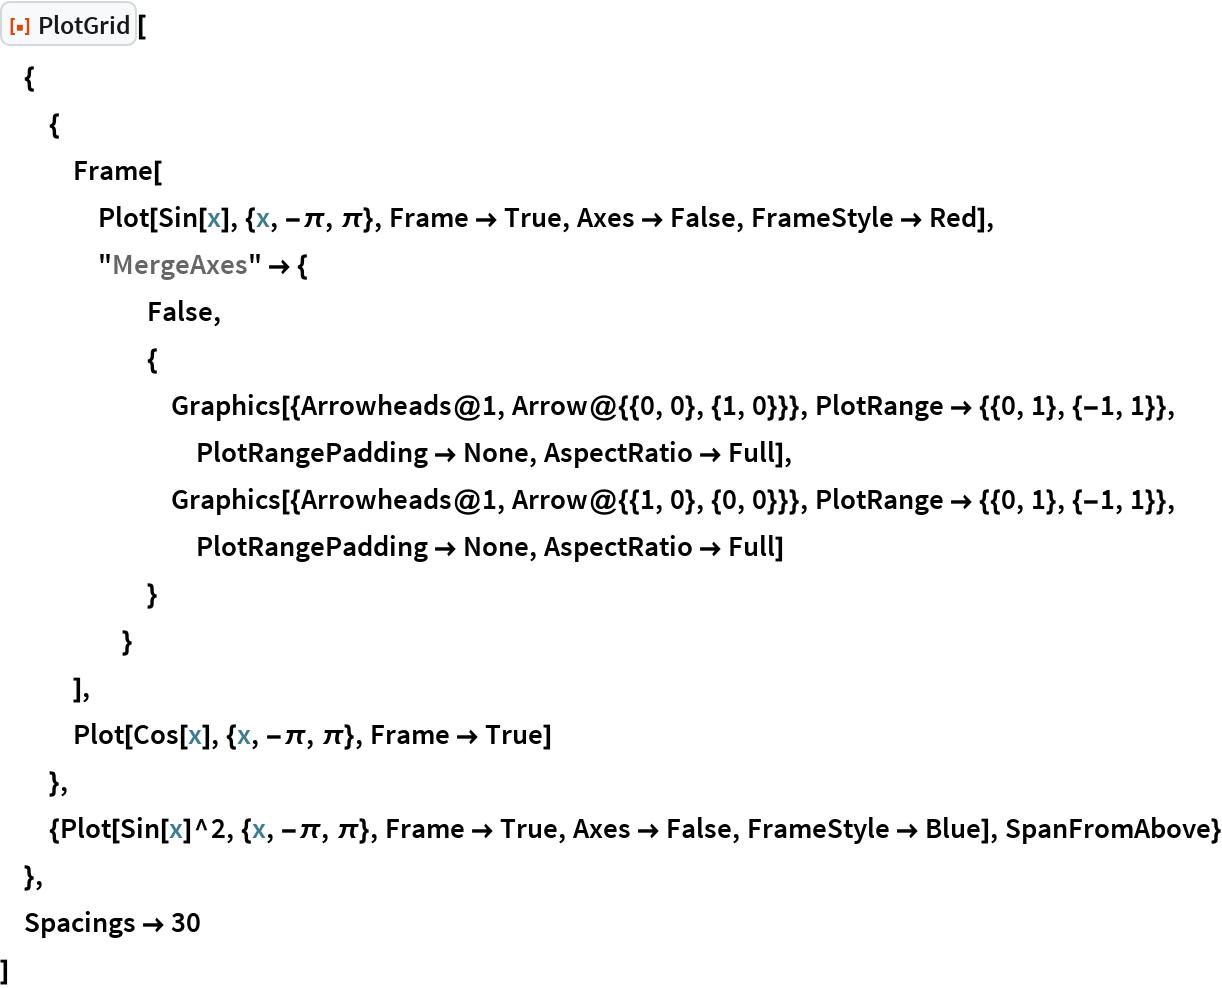 "ResourceFunction[""PlotGrid""][  {   {    Frame[     Plot[Sin[x], {x, -\[Pi], \[Pi]}, Frame -> True, Axes -> False, FrameStyle -> Red],     ""MergeAxes"" -> {       False,       {        Graphics[{Arrowheads@1, Arrow@{{0, 0}, {1, 0}}}, PlotRange -> {{0, 1}, {-1, 1}}, PlotRangePadding -> None, AspectRatio -> Full],        Graphics[{Arrowheads@1, Arrow@{{1, 0}, {0, 0}}}, PlotRange -> {{0, 1}, {-1, 1}}, PlotRangePadding -> None, AspectRatio -> Full]        }       }     ],    Plot[Cos[x], {x, -\[Pi], \[Pi]}, Frame -> True]    },   {Plot[Sin[x]^2, {x, -\[Pi], \[Pi]}, Frame -> True, Axes -> False, FrameStyle -> Blue], SpanFromAbove}   },  Spacings -> 30  ]"